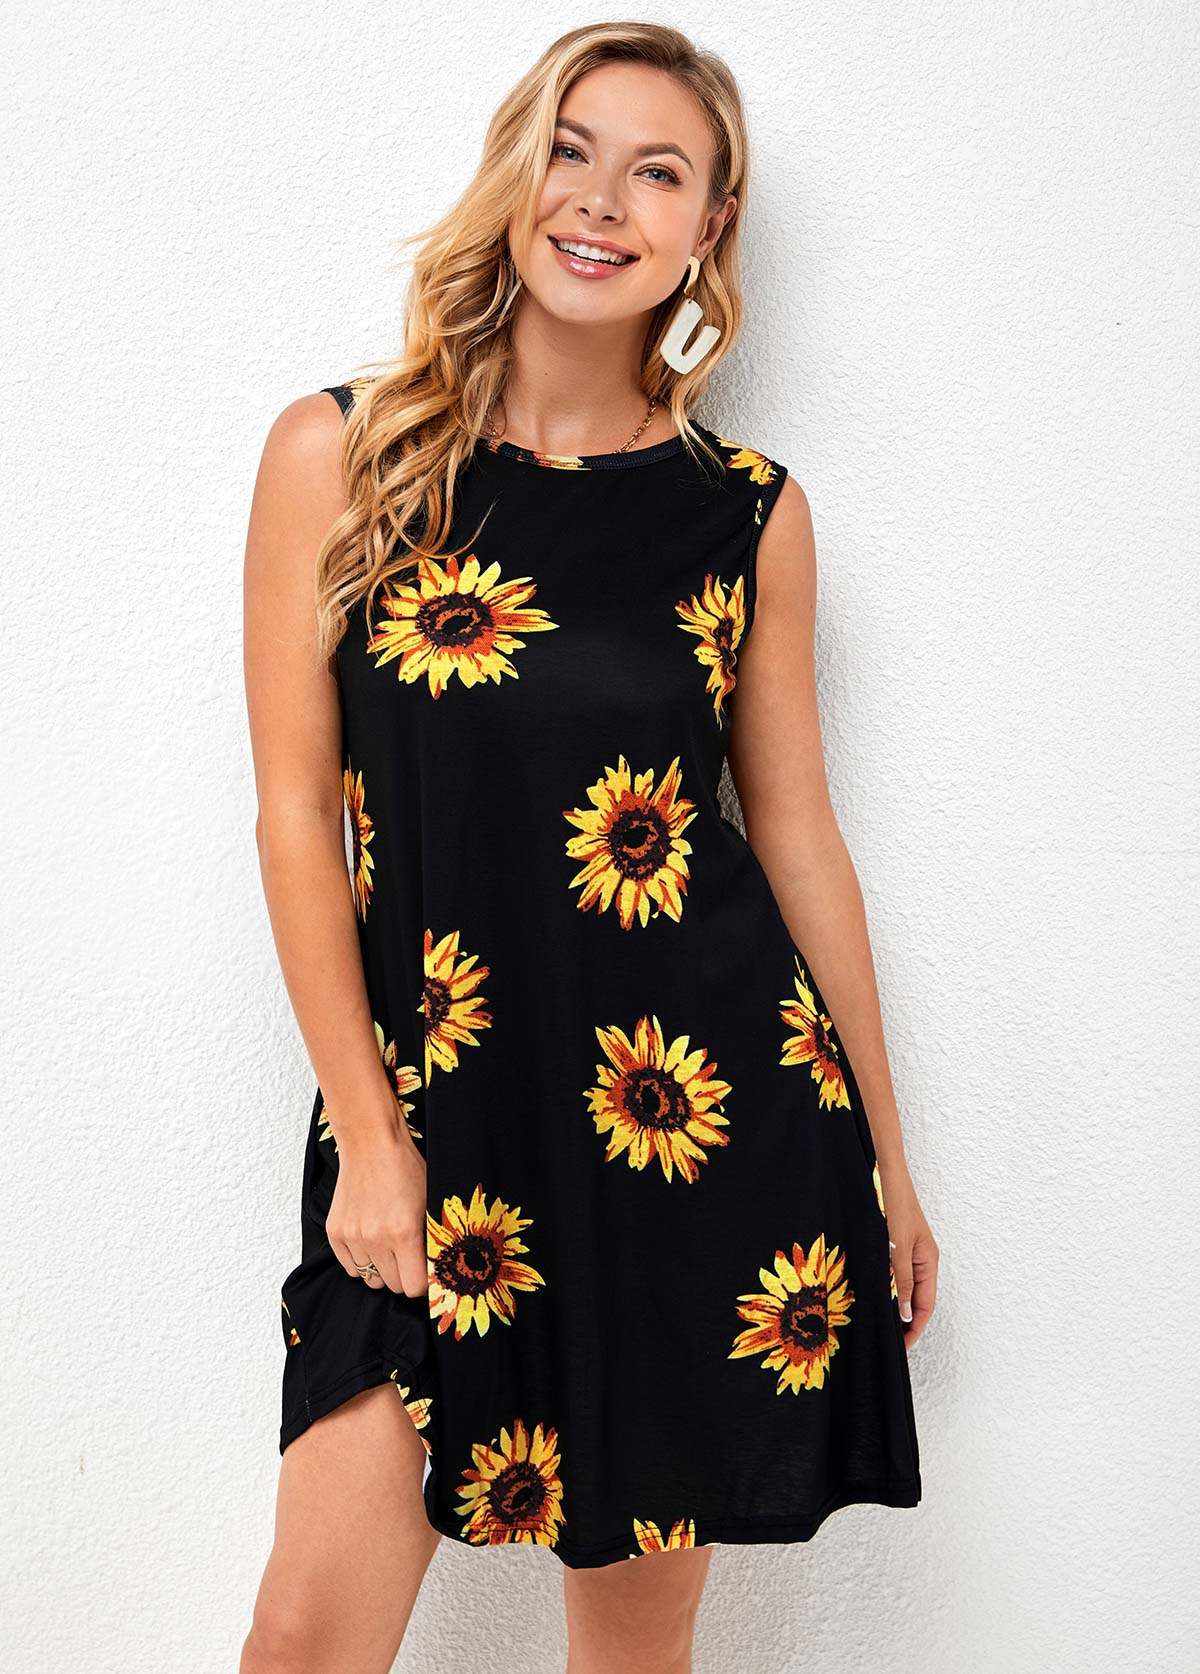 Sleeveless Sunflower Print Round Neck Dress